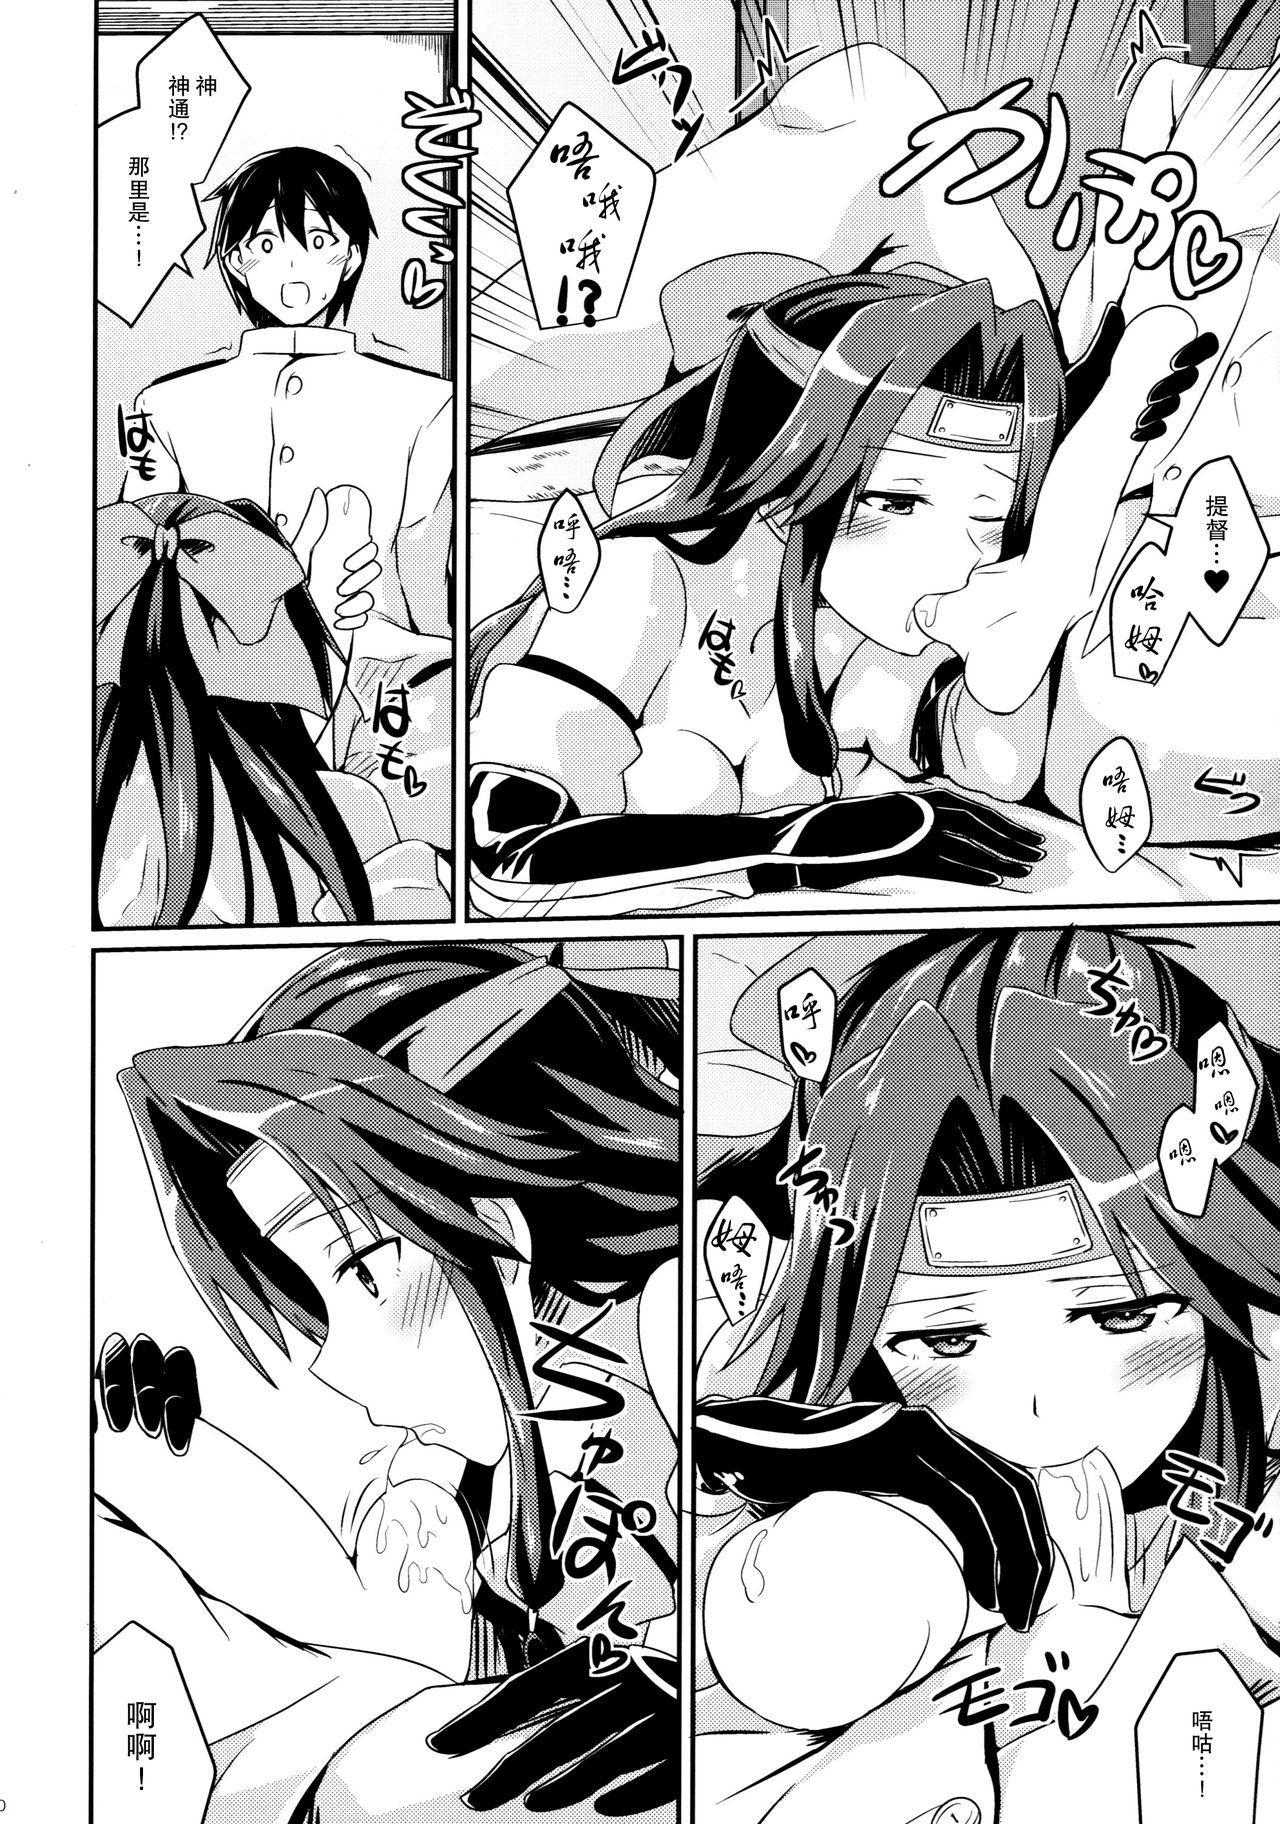 Jintsuu no Omoi 9